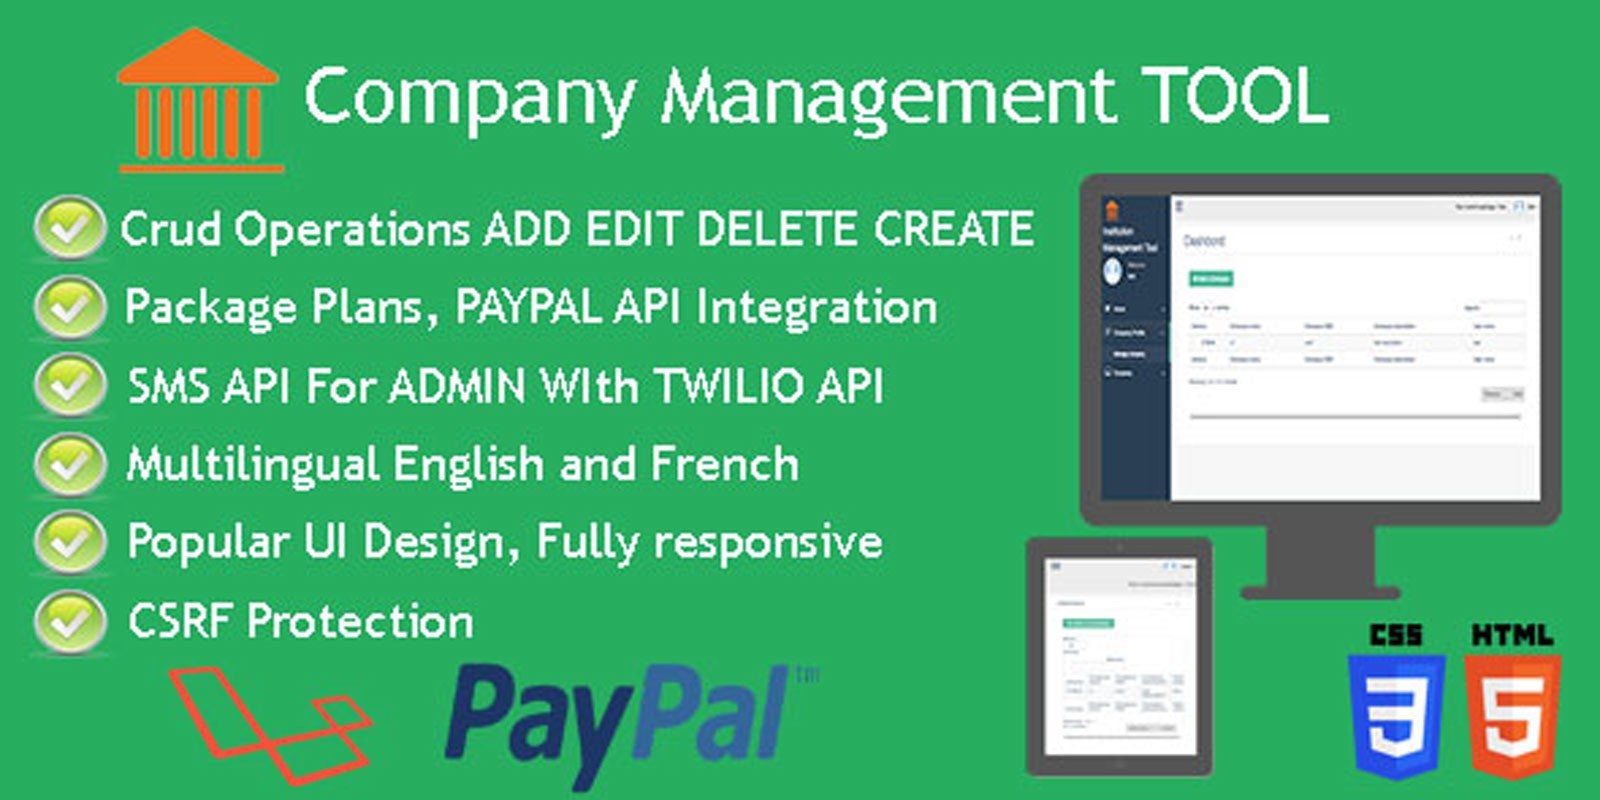 Company management tool php script miscellaneous php scripts company management tool php script baditri Images